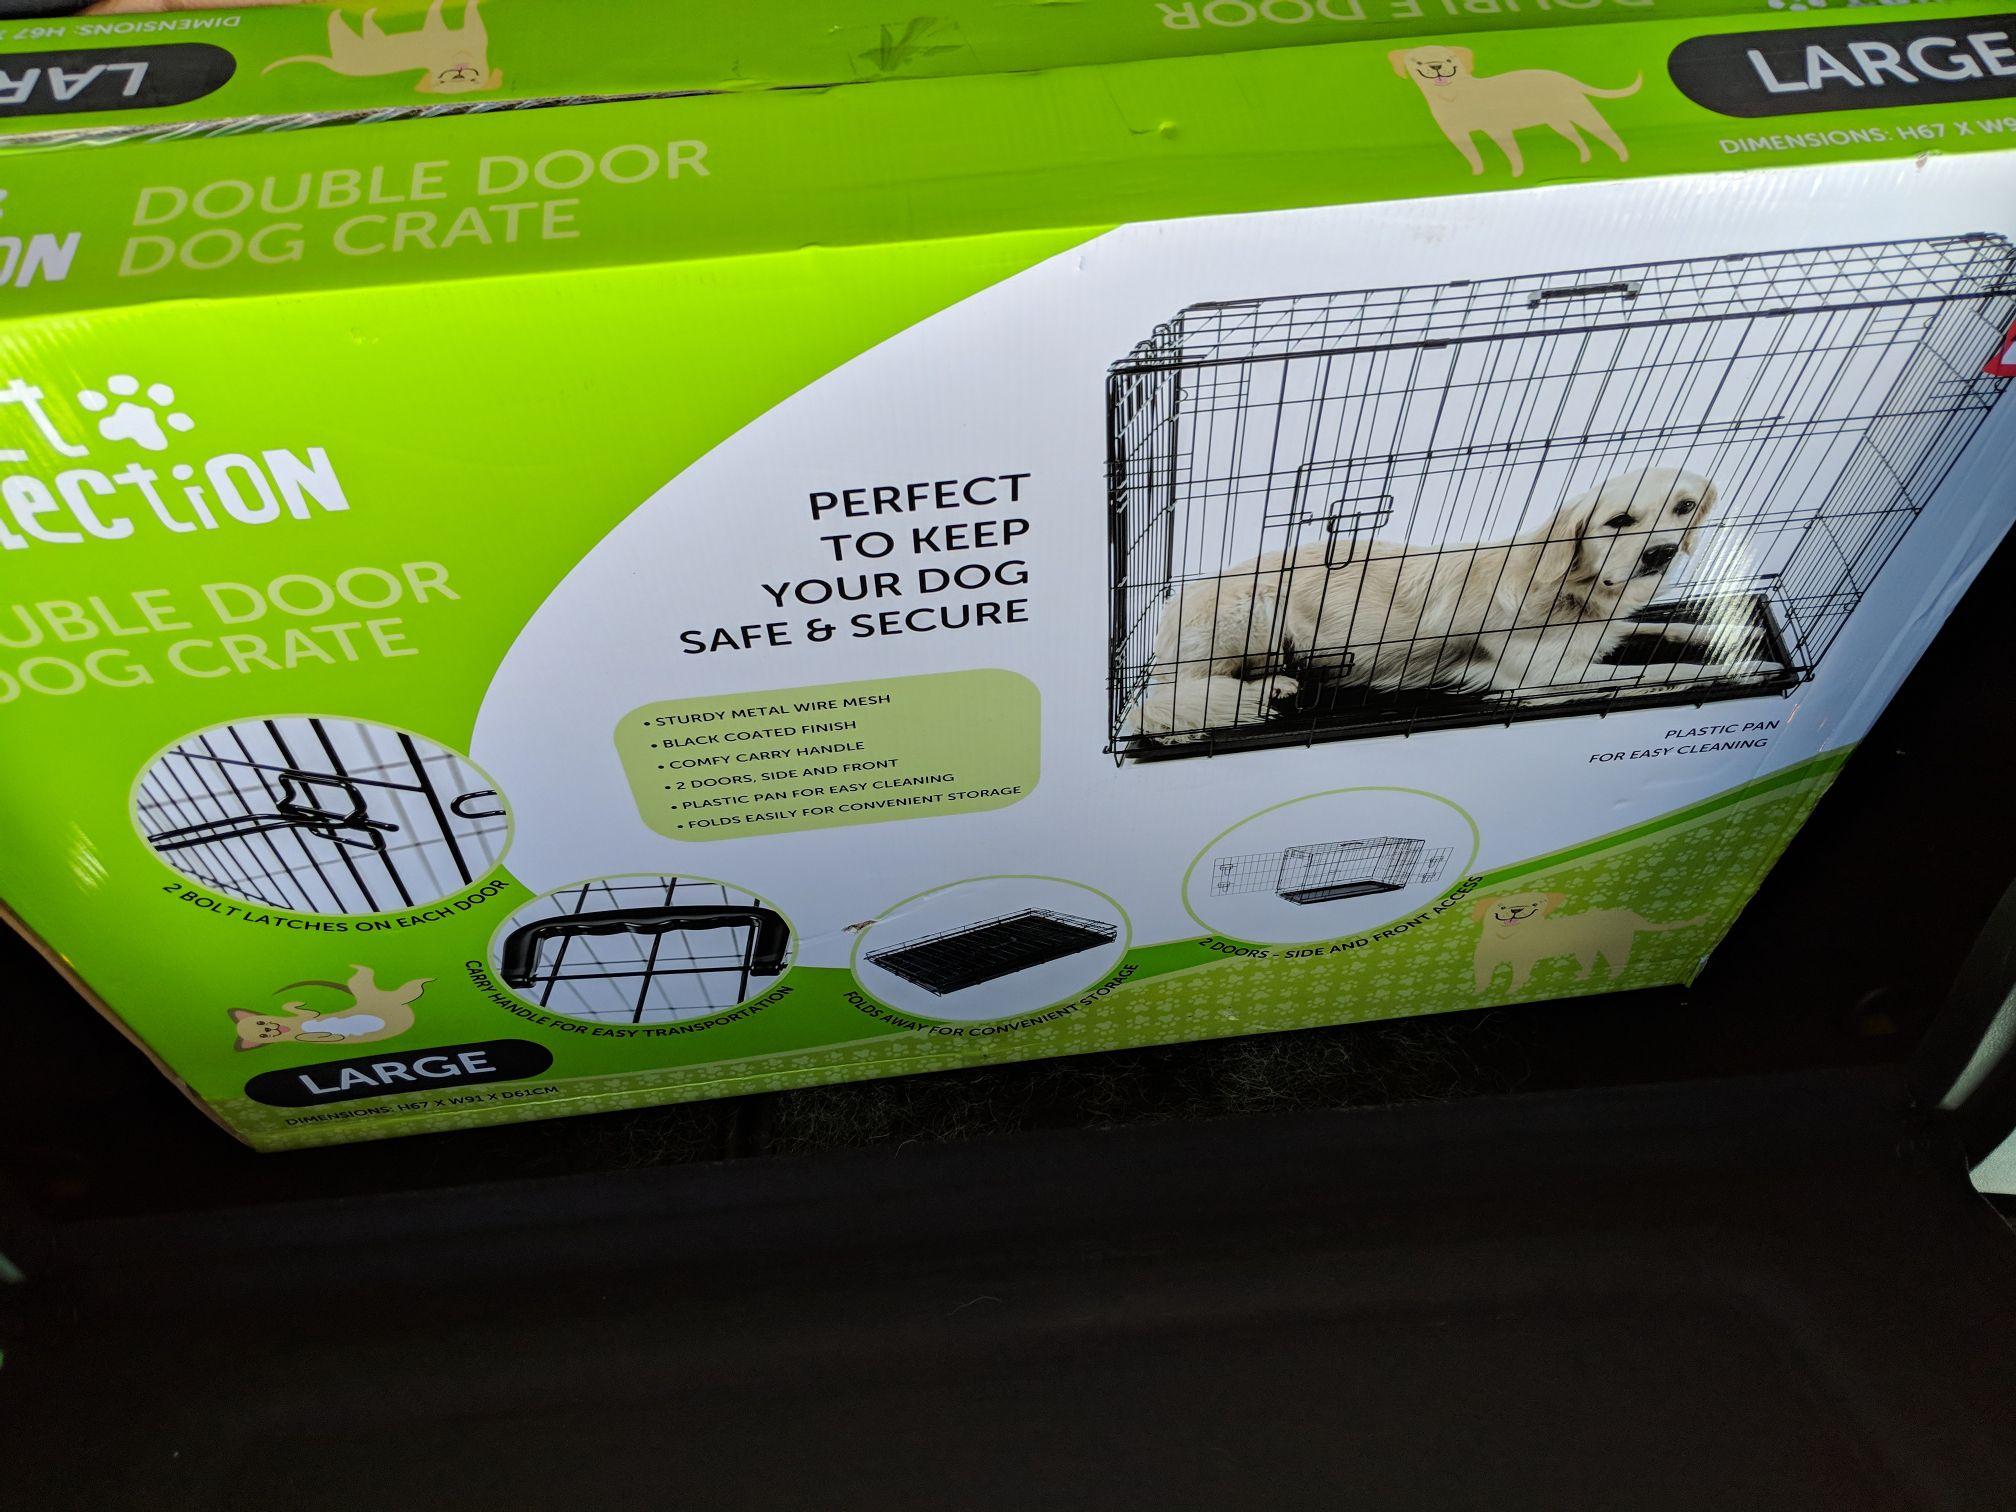 Aldi Large Dog Crate £4.99 - Telford